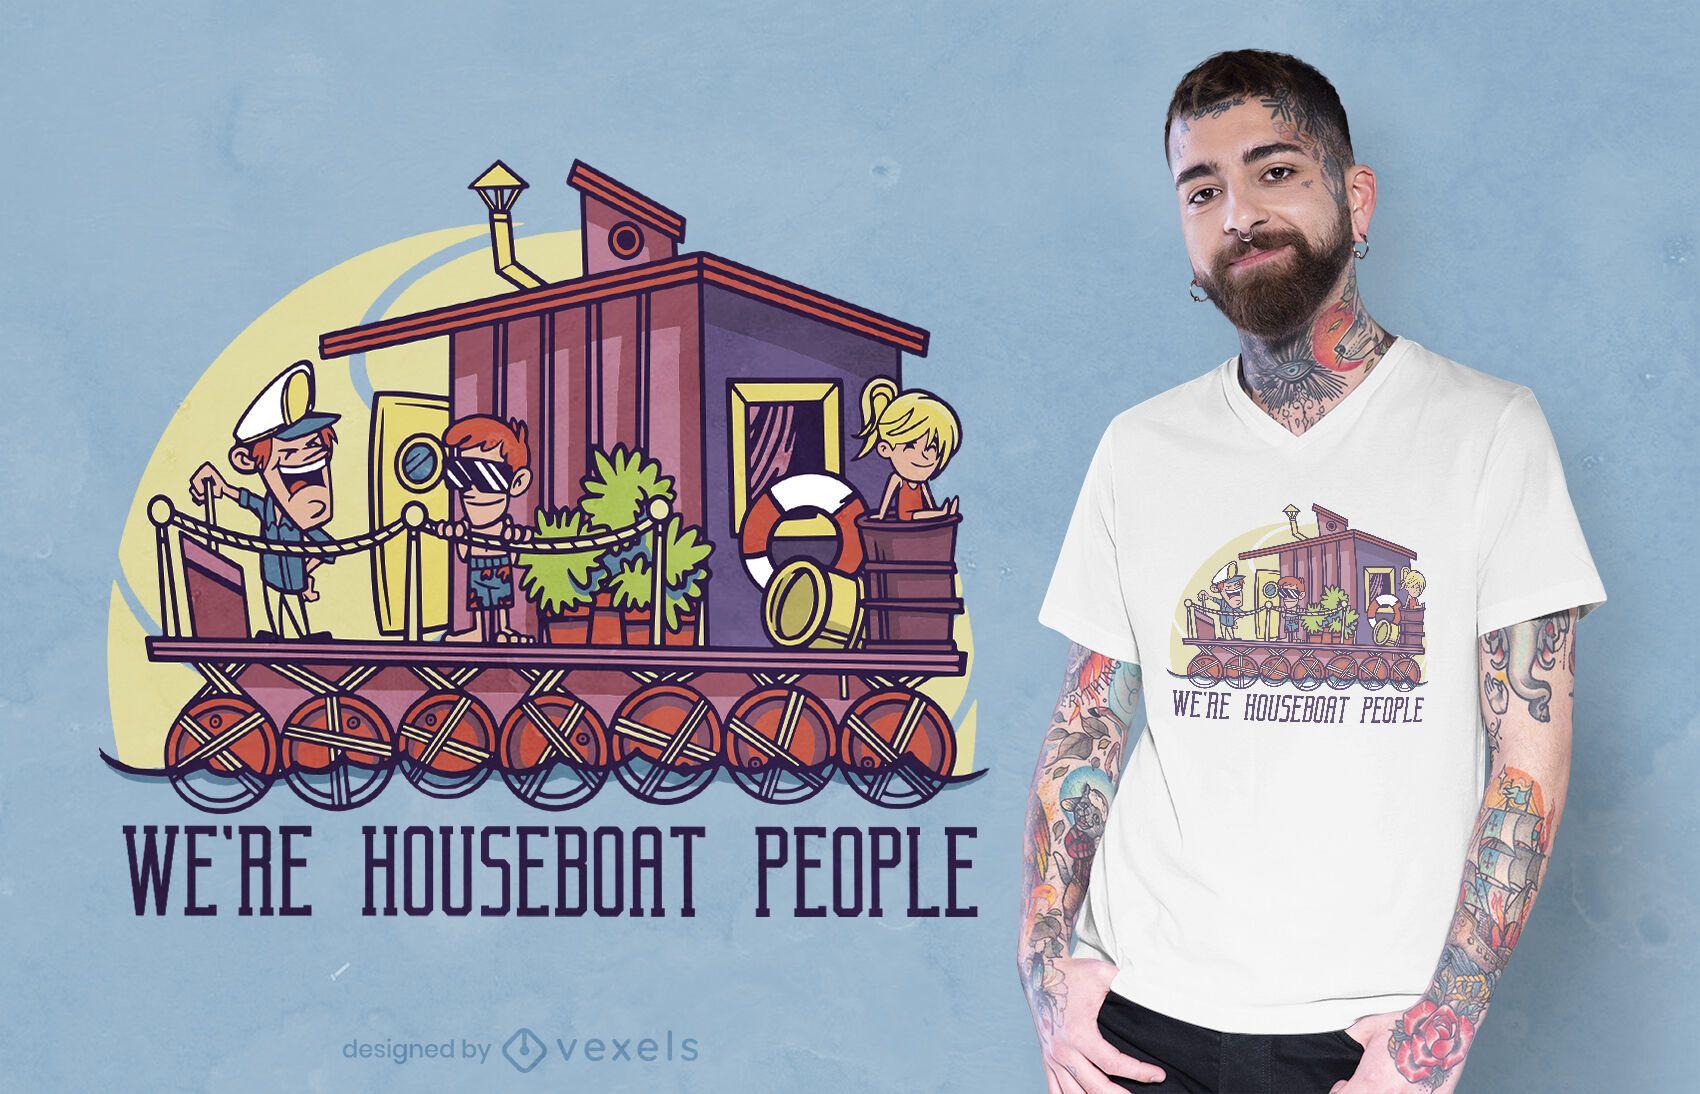 Houseboat people t-shirt design